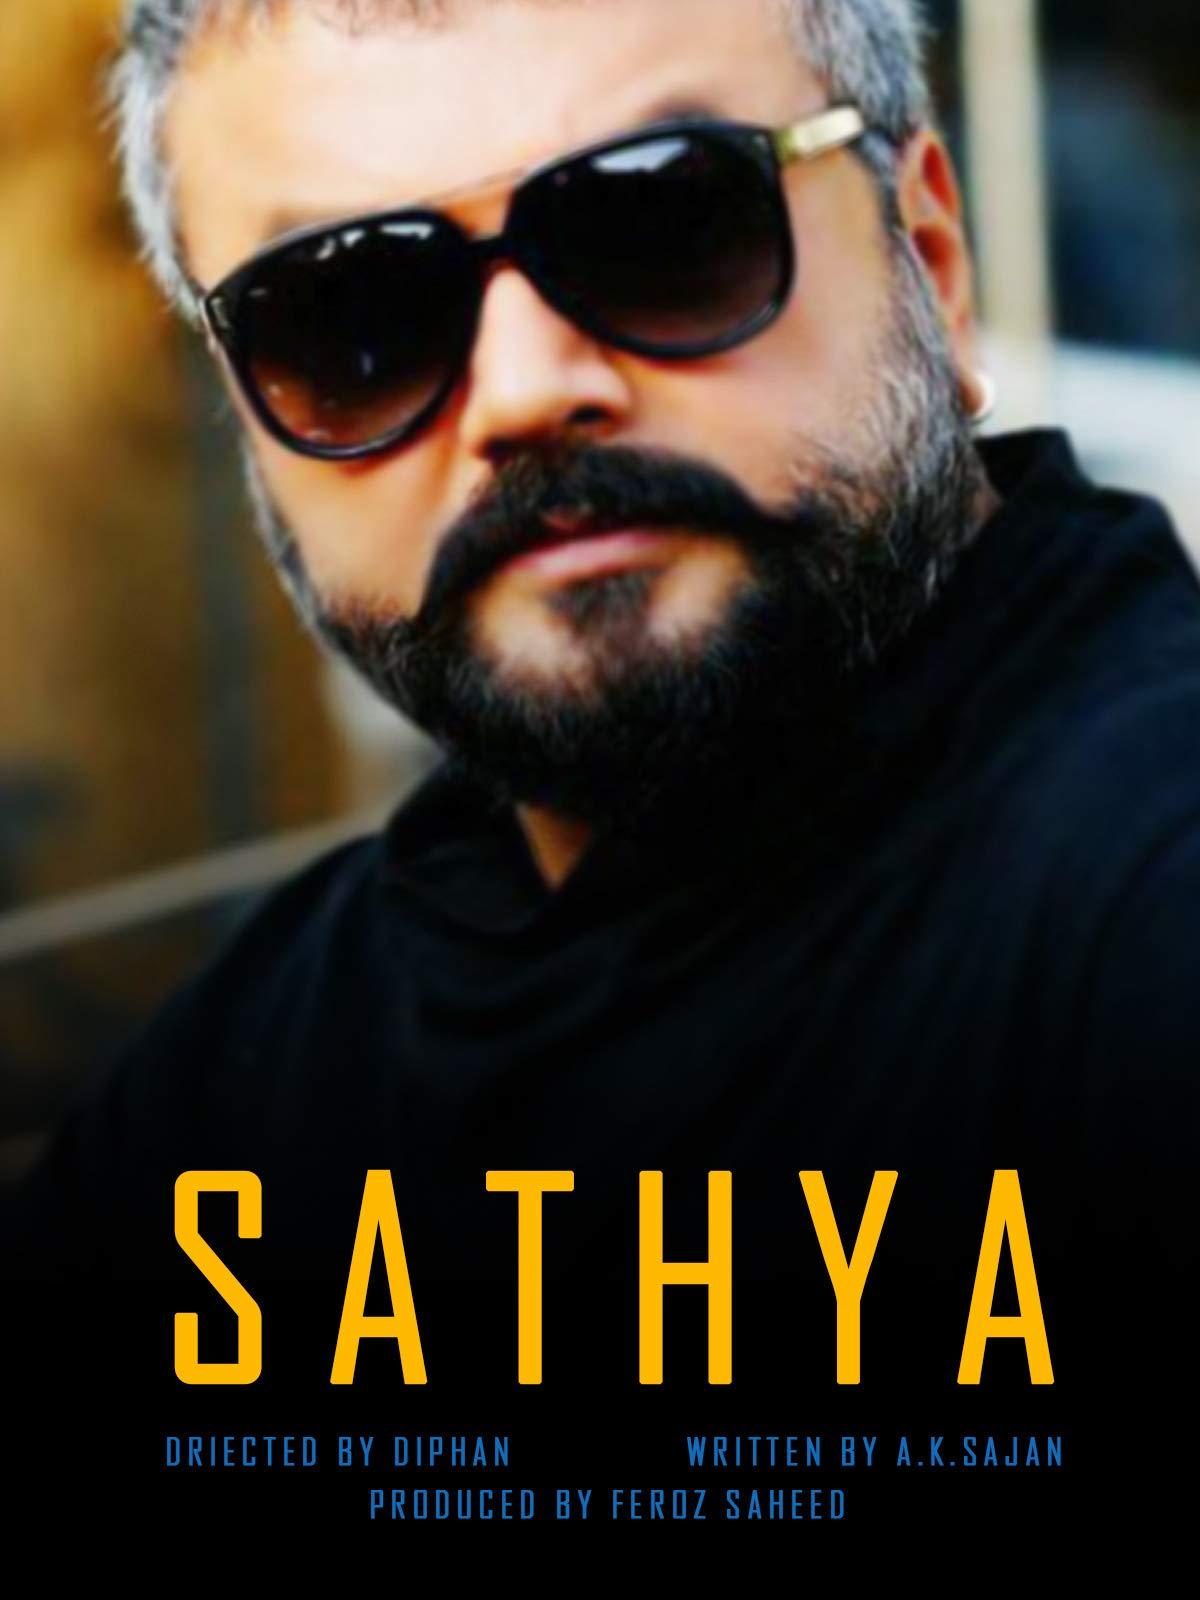 Sathya